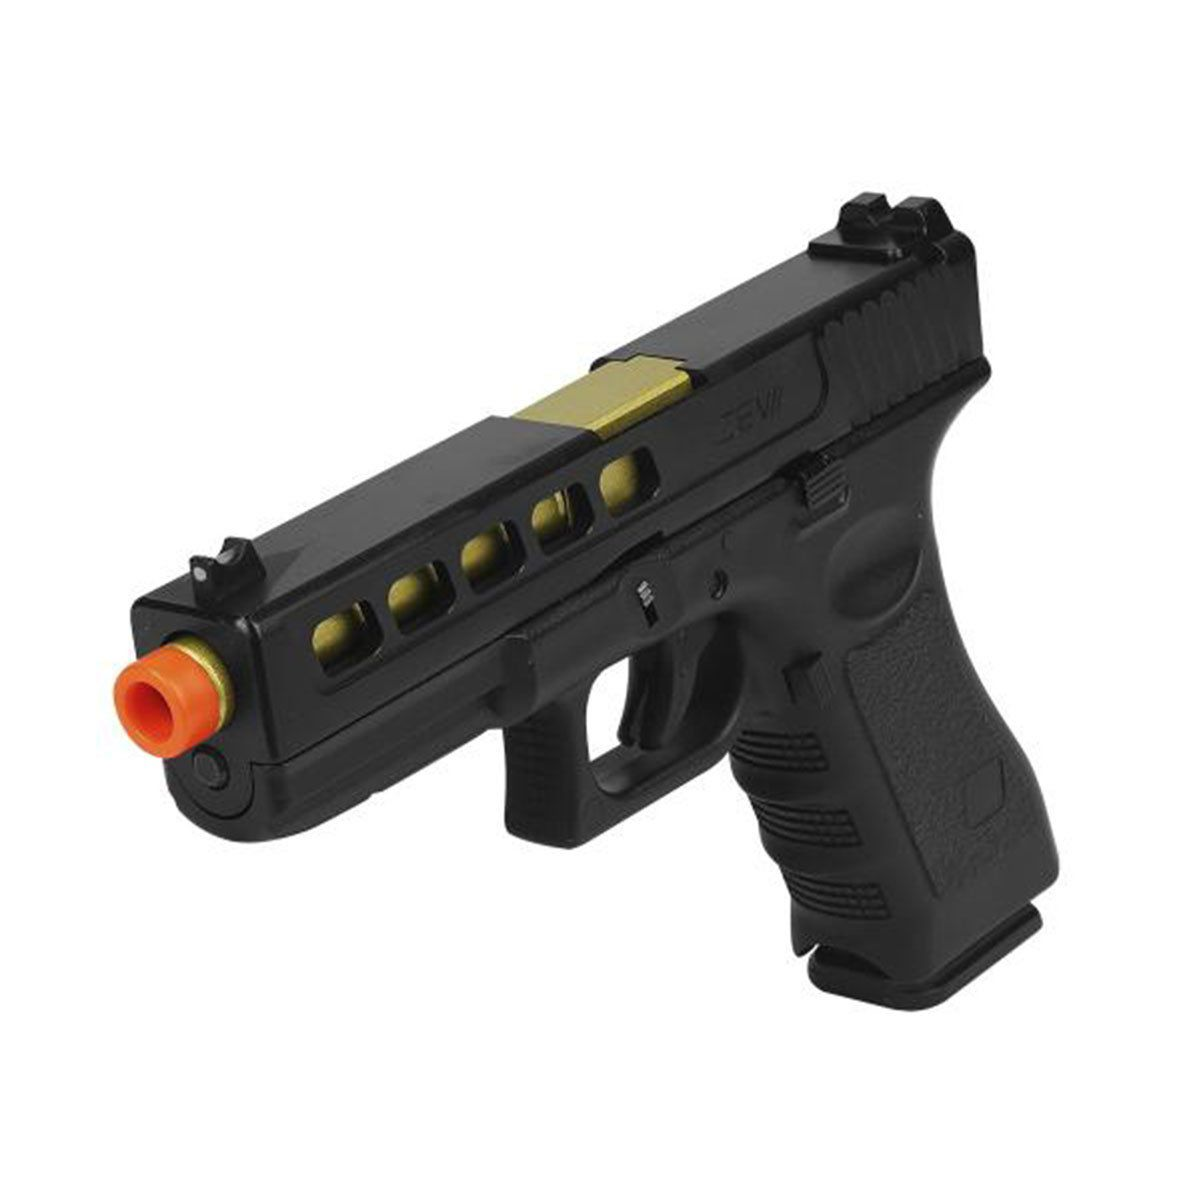 Pistola de Airsoft Double Bell G17 ZEV Mod. 3 GBB 6mm